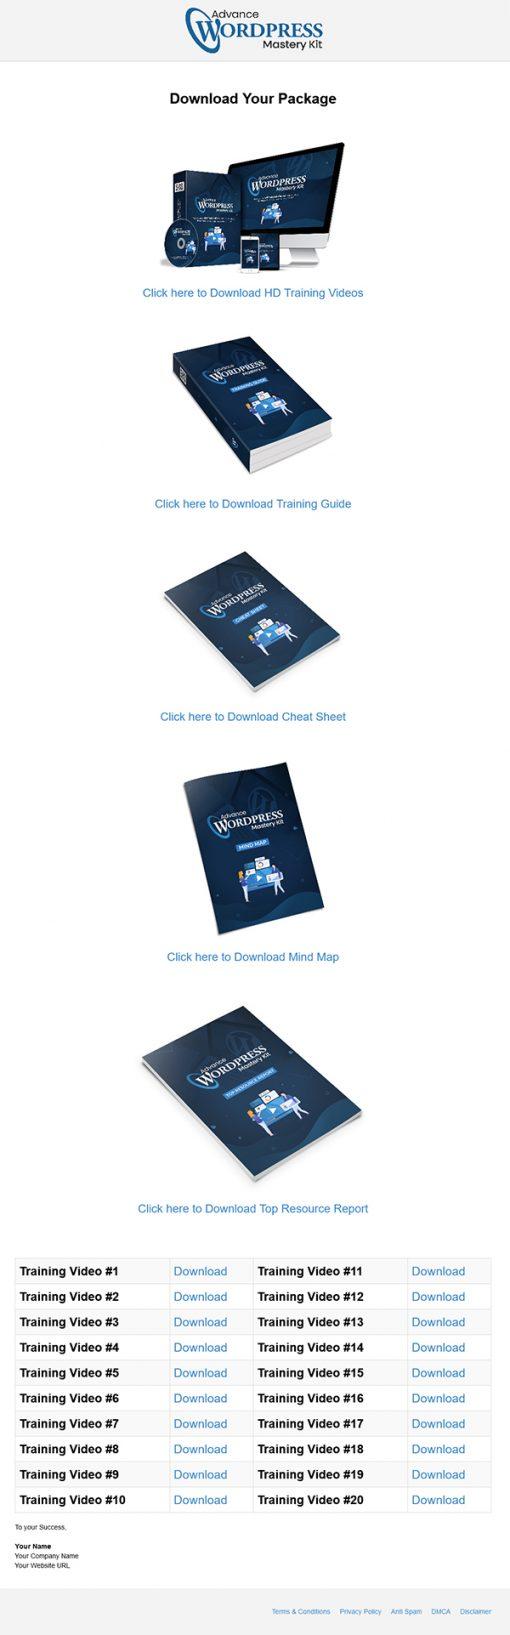 Advance Wordpress Mastery Kit PLR Ebook and PLR Videos Package